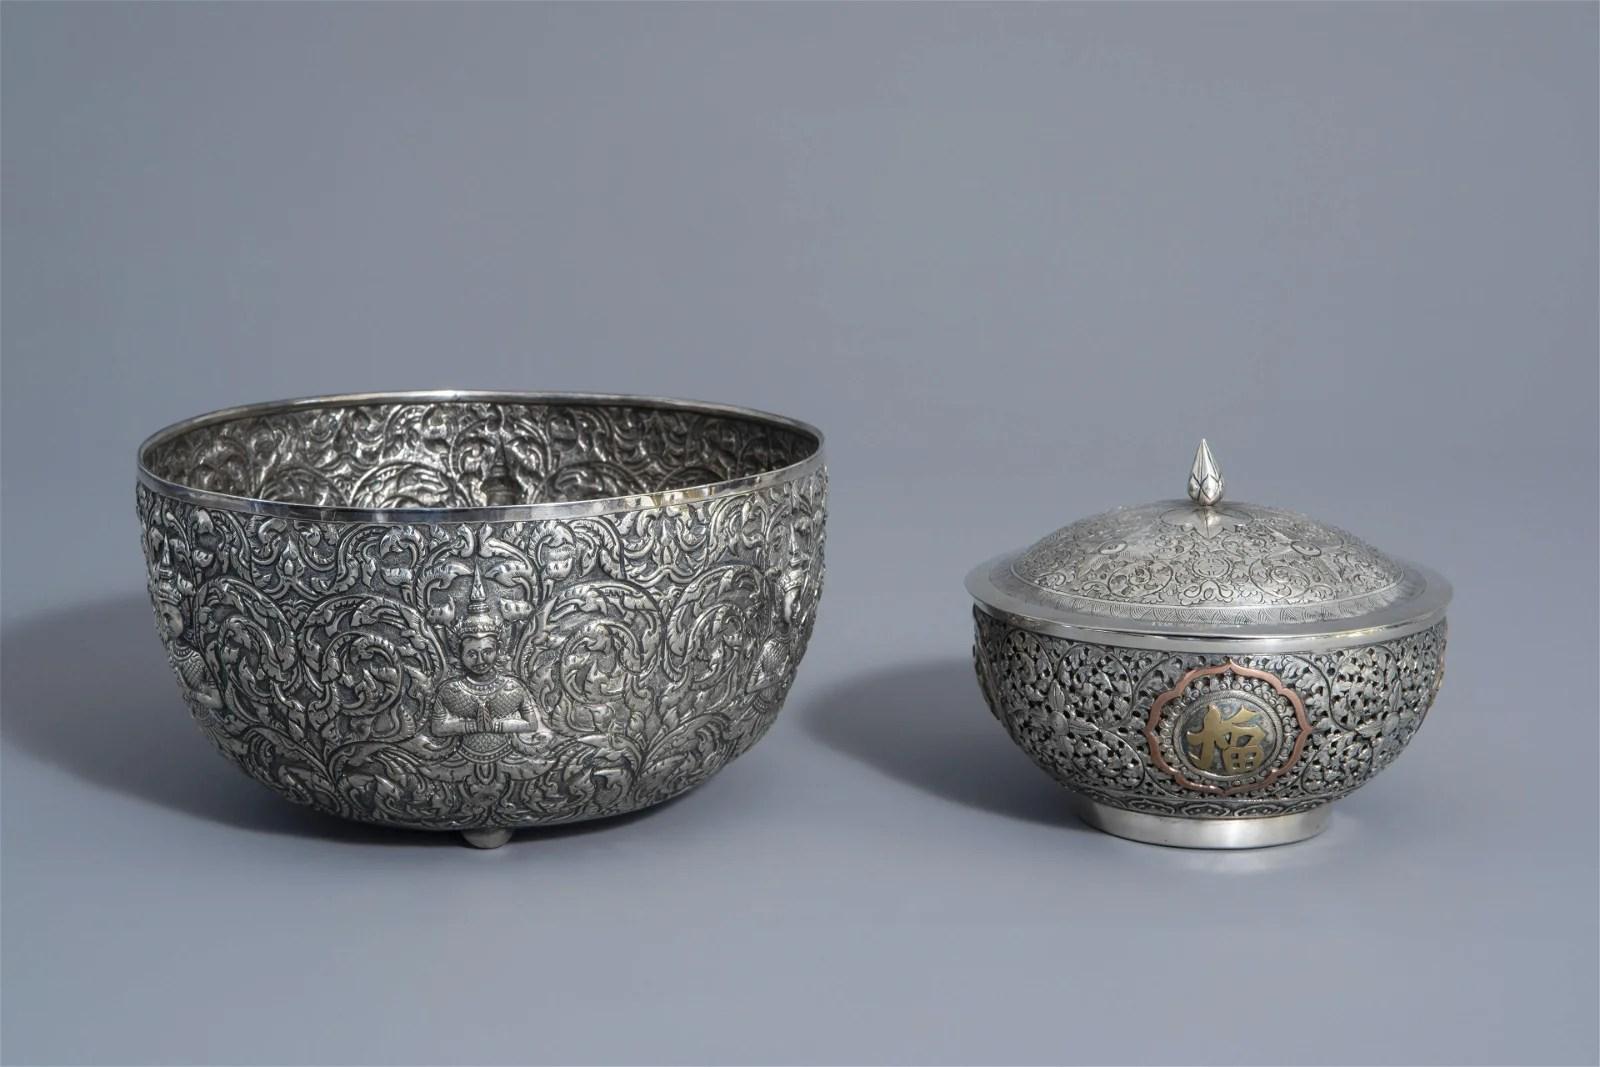 A Thai silver Bencharong bowl and a Chinese silver bowl